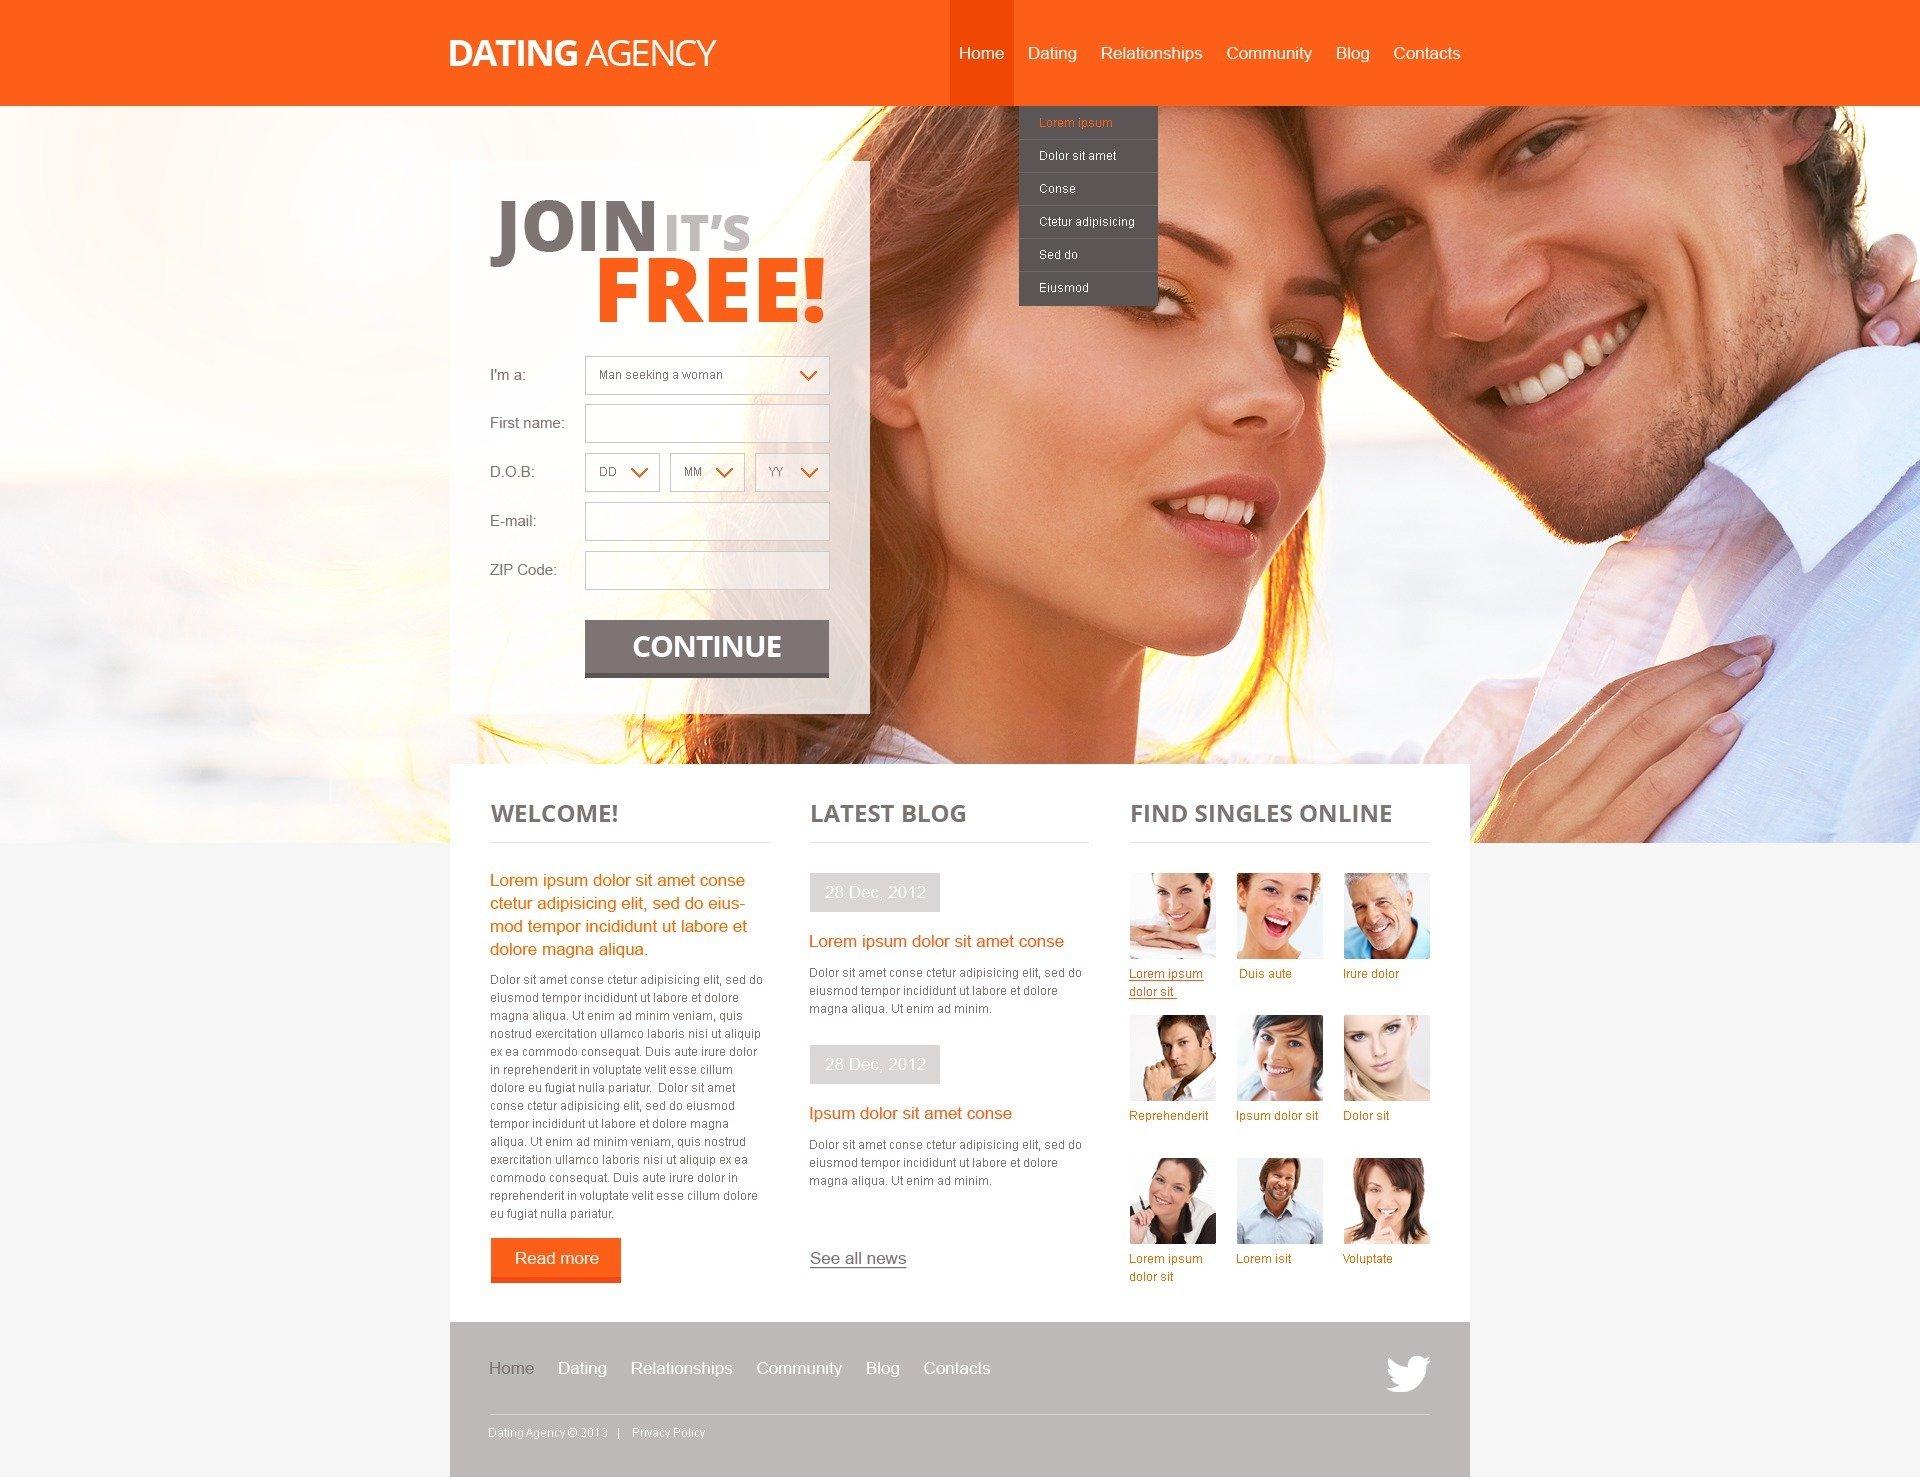 Free dating site design